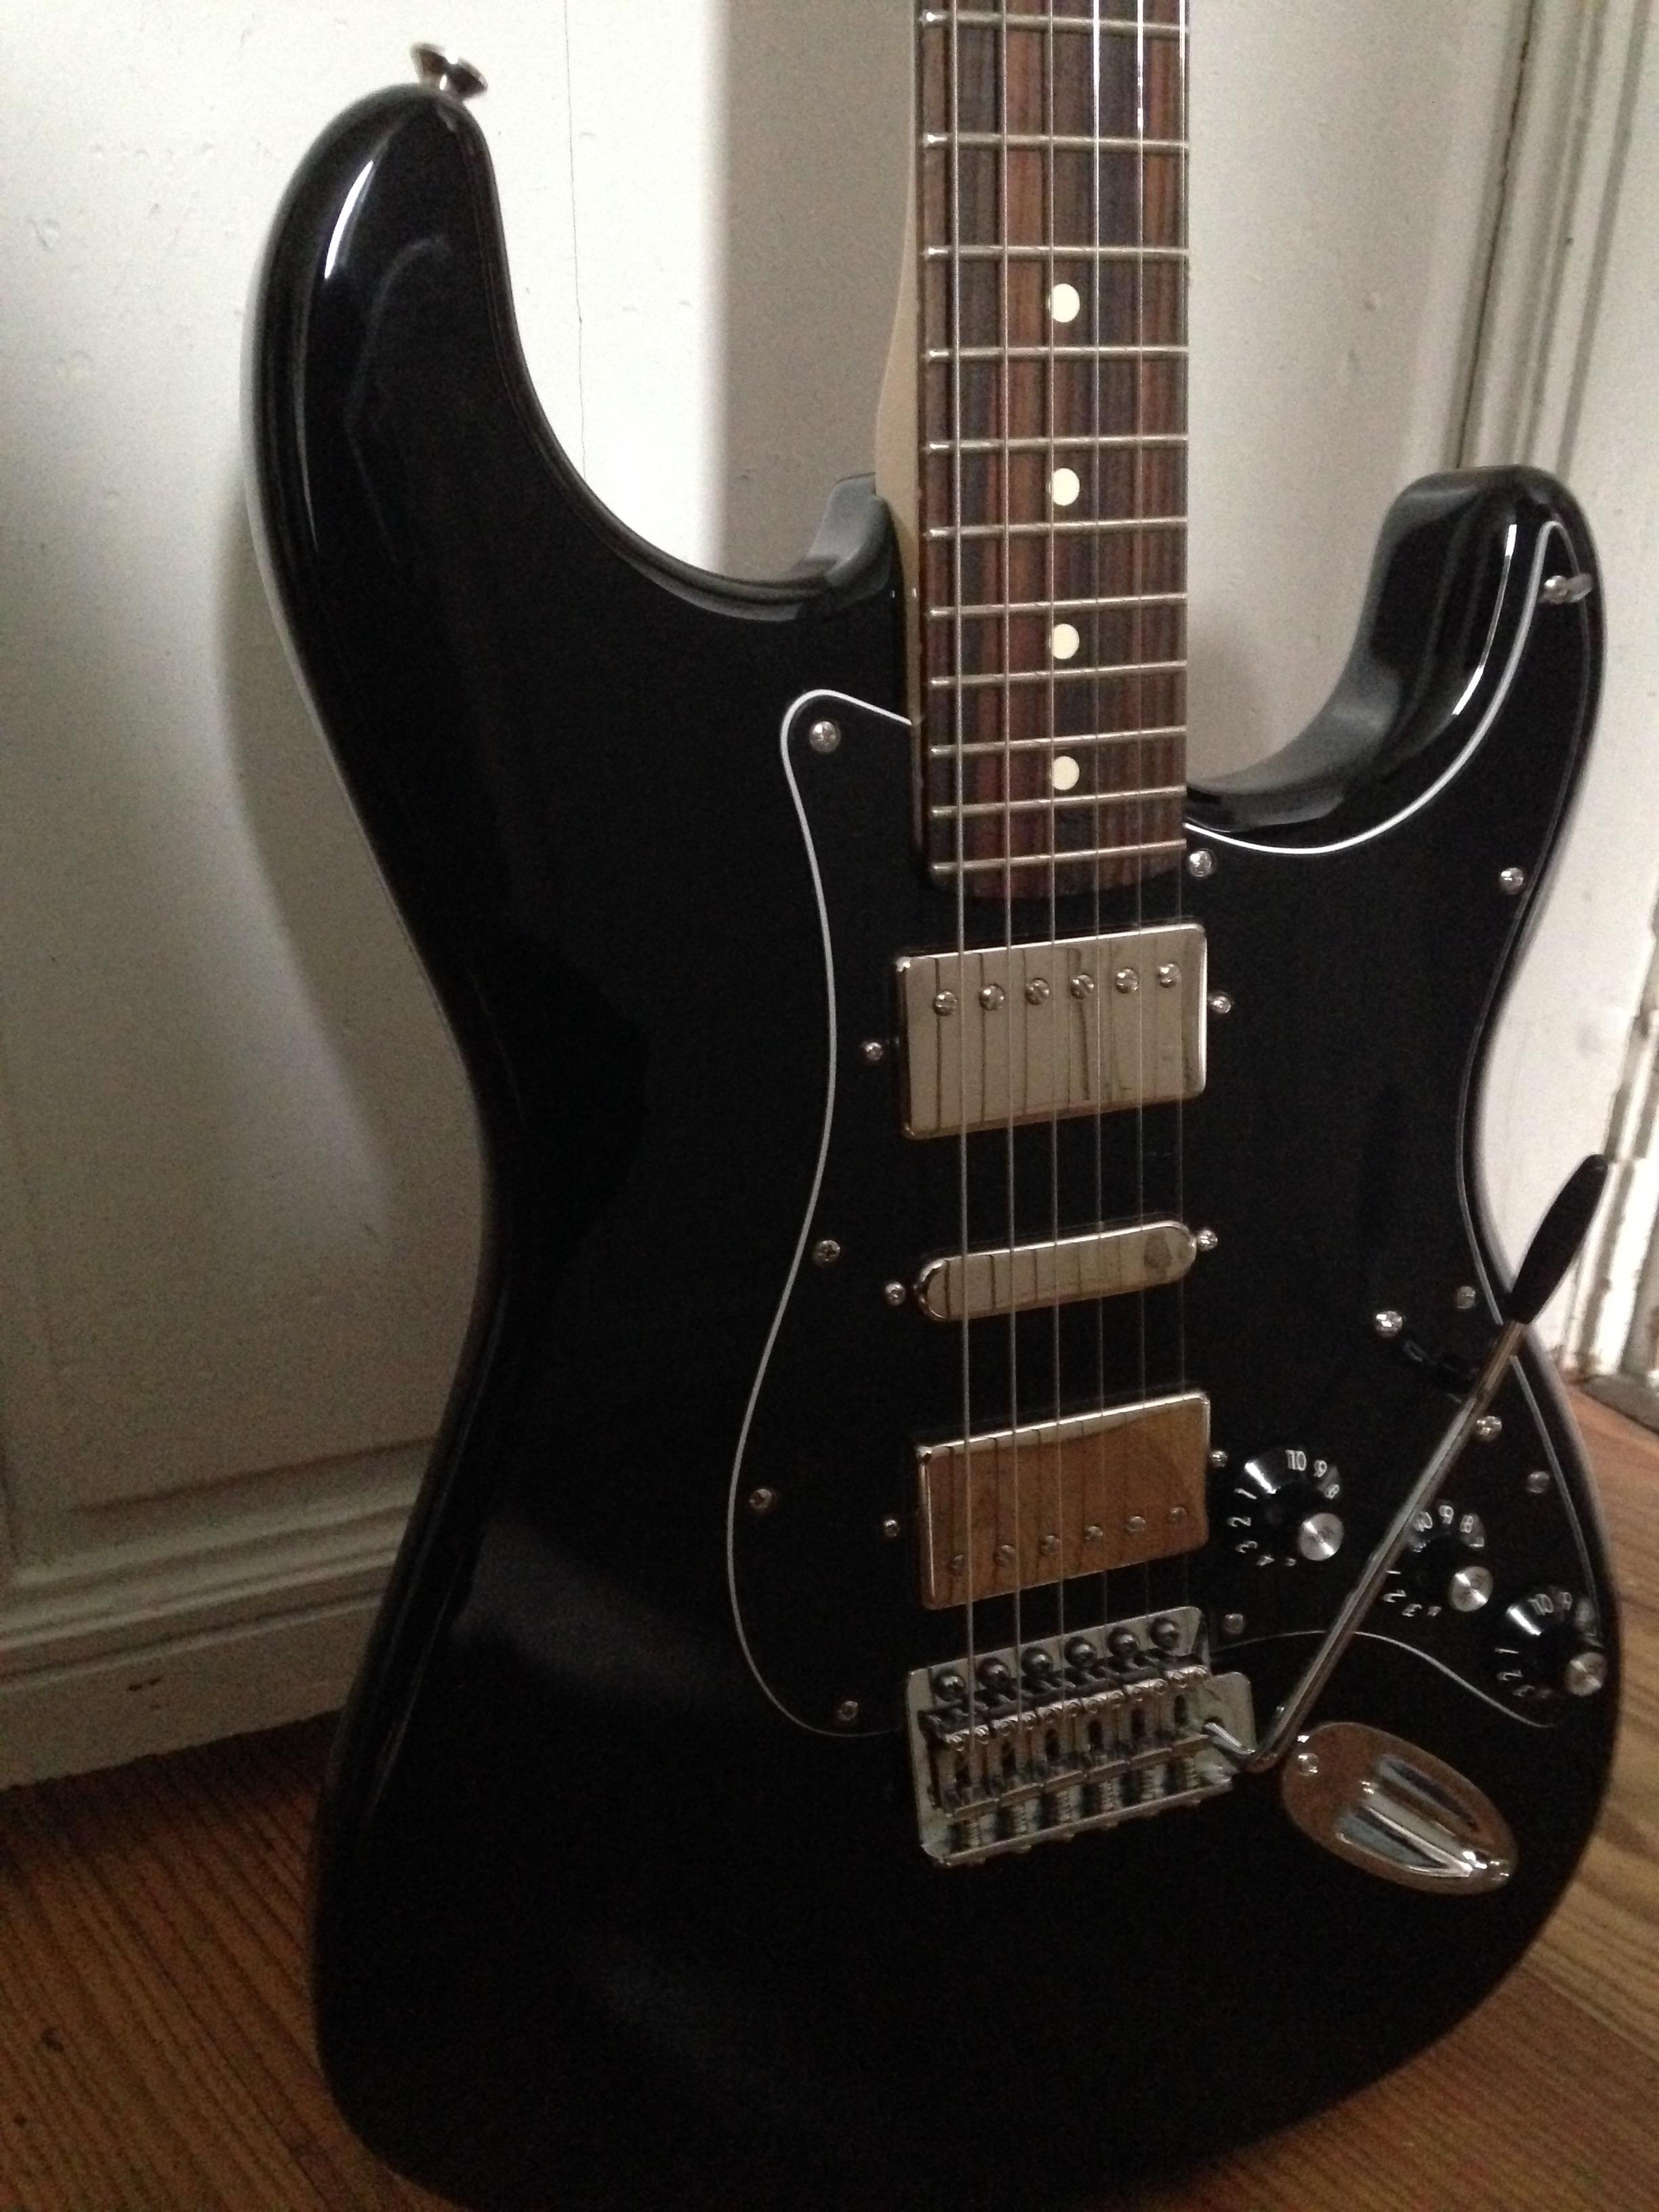 Wiring Diagram For Fender Blacktop Stratocaster